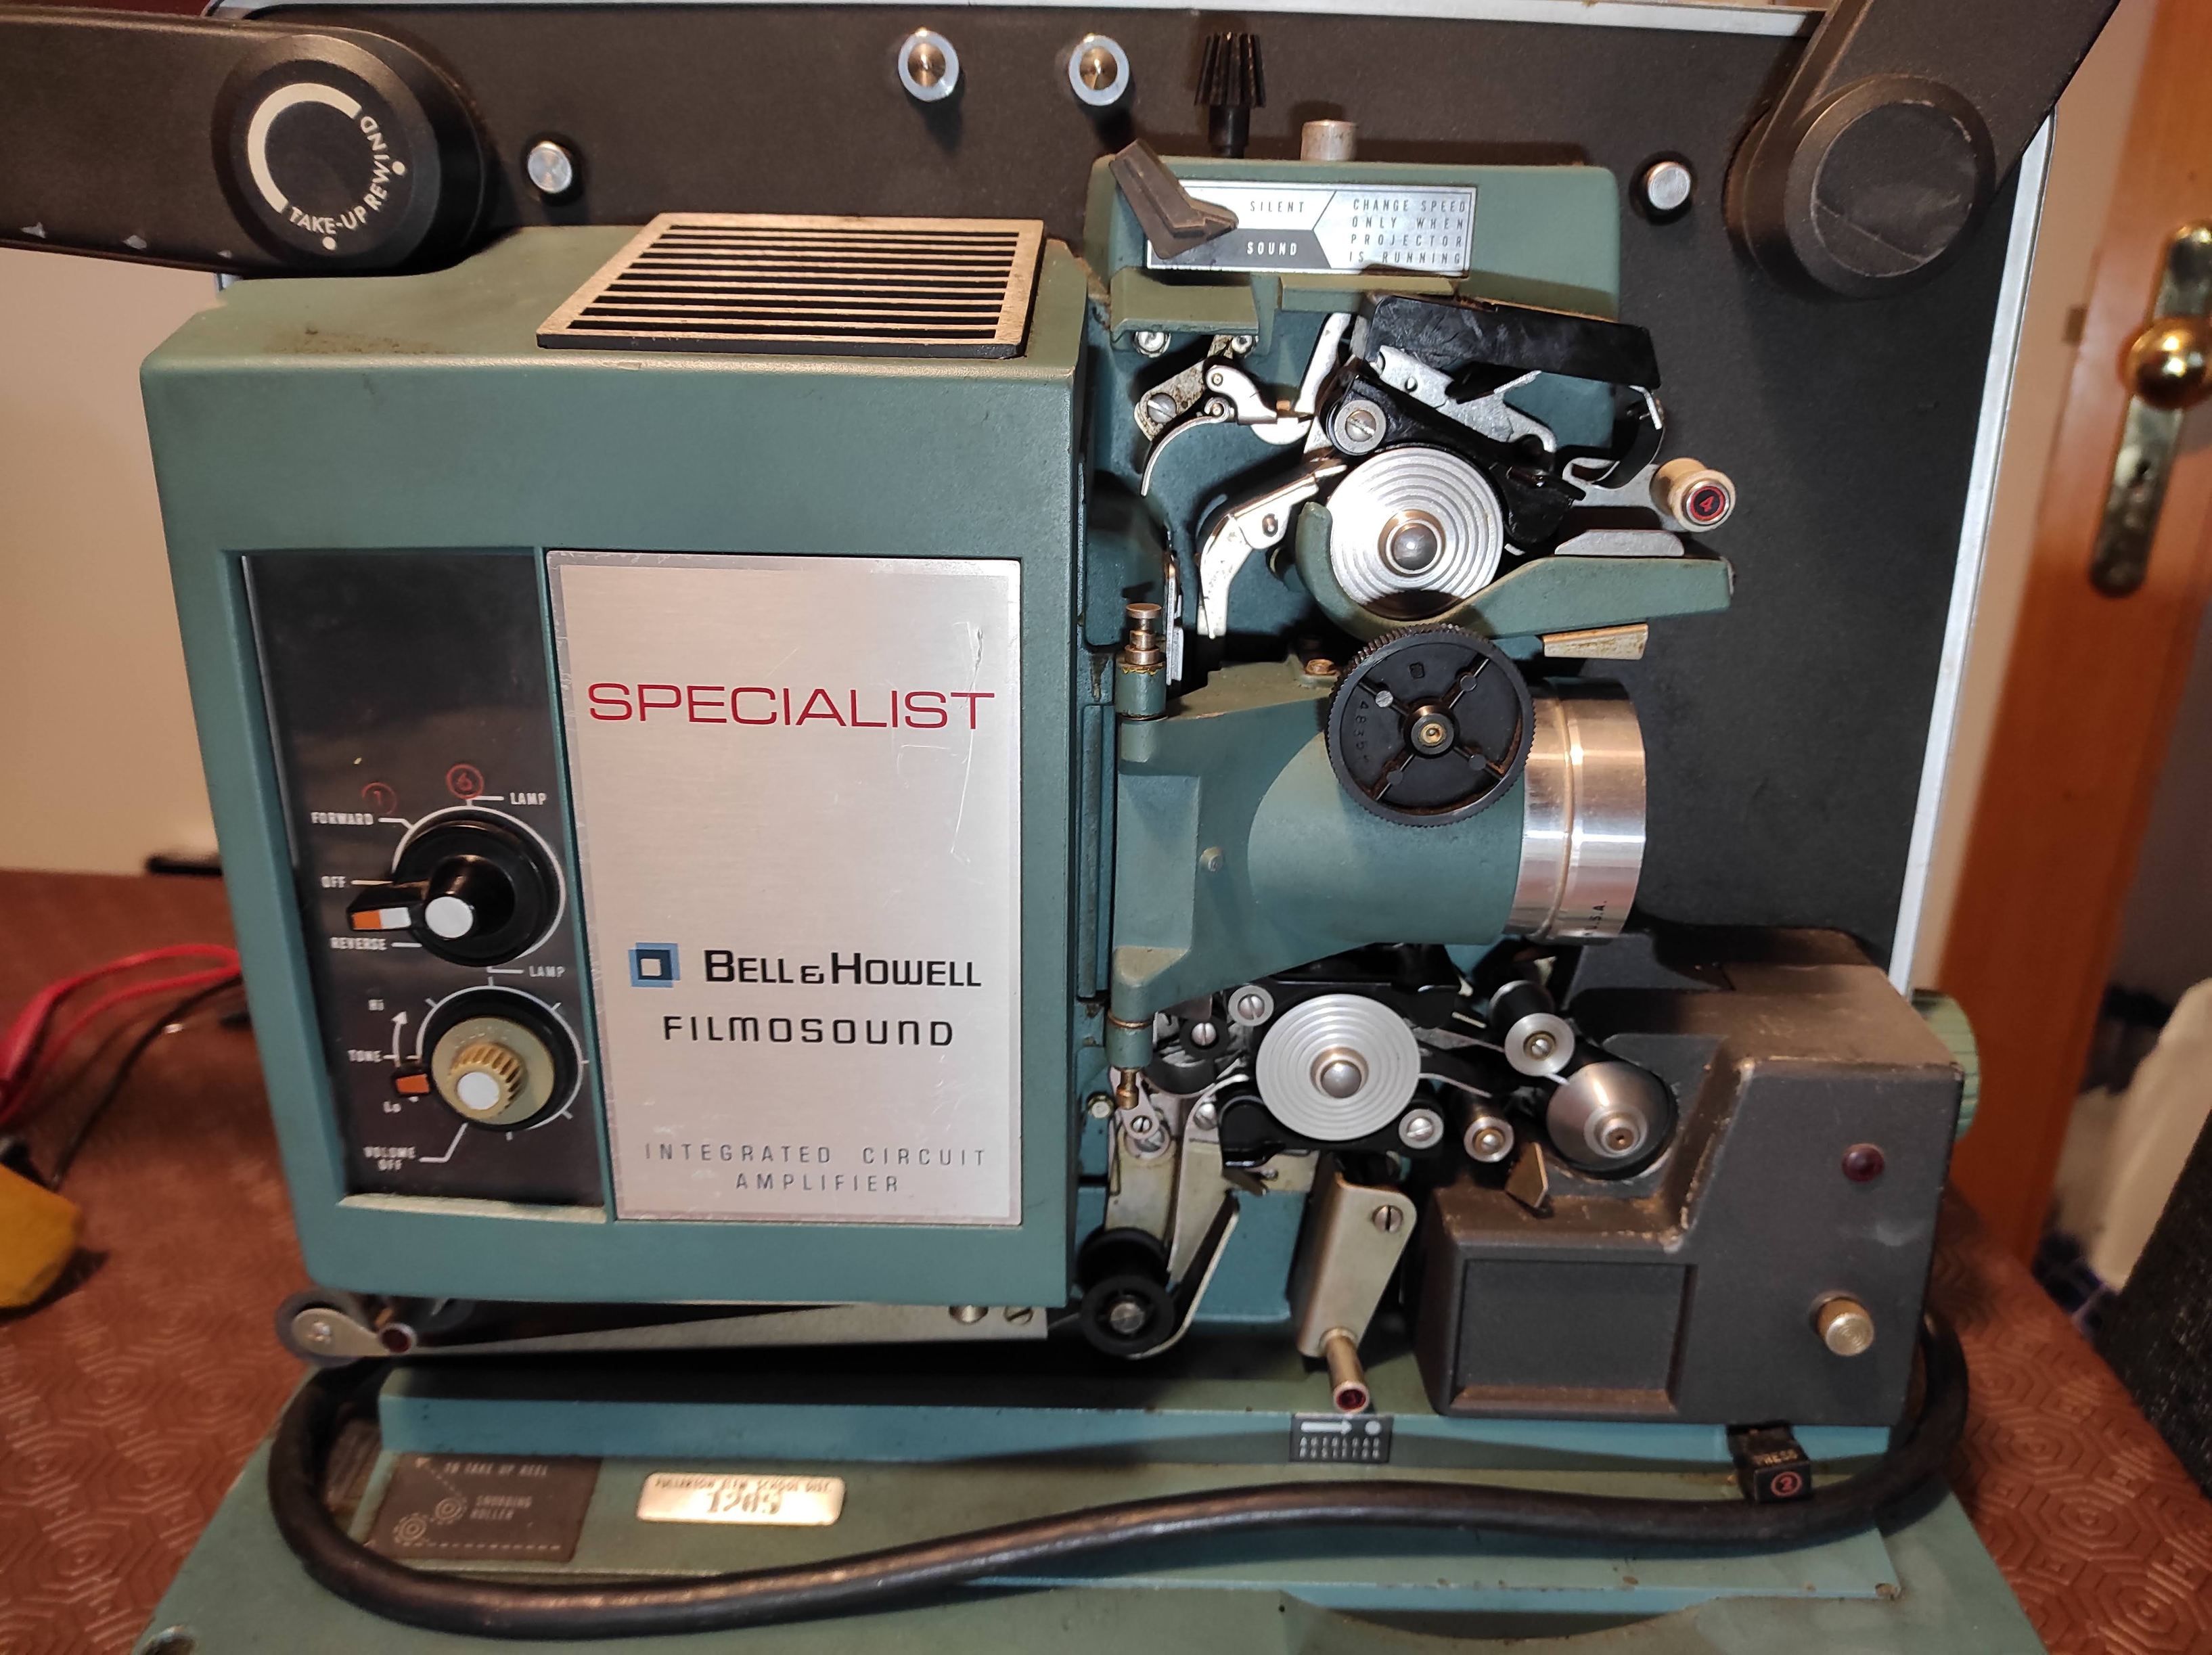 Filmosound 550T